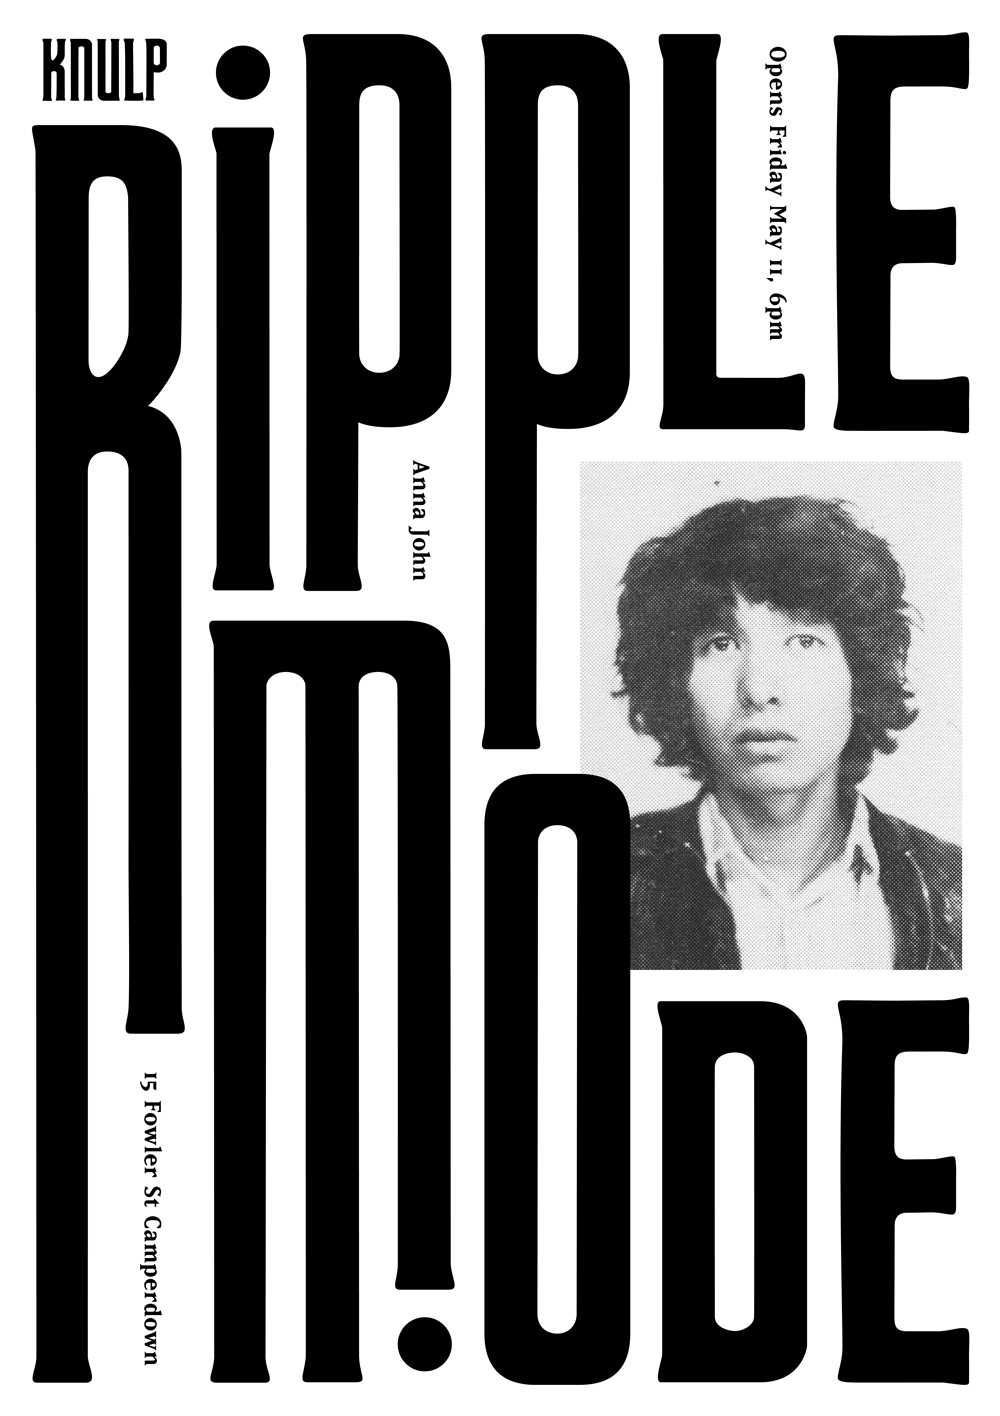 RIPPLE-MODE_1000.jpg